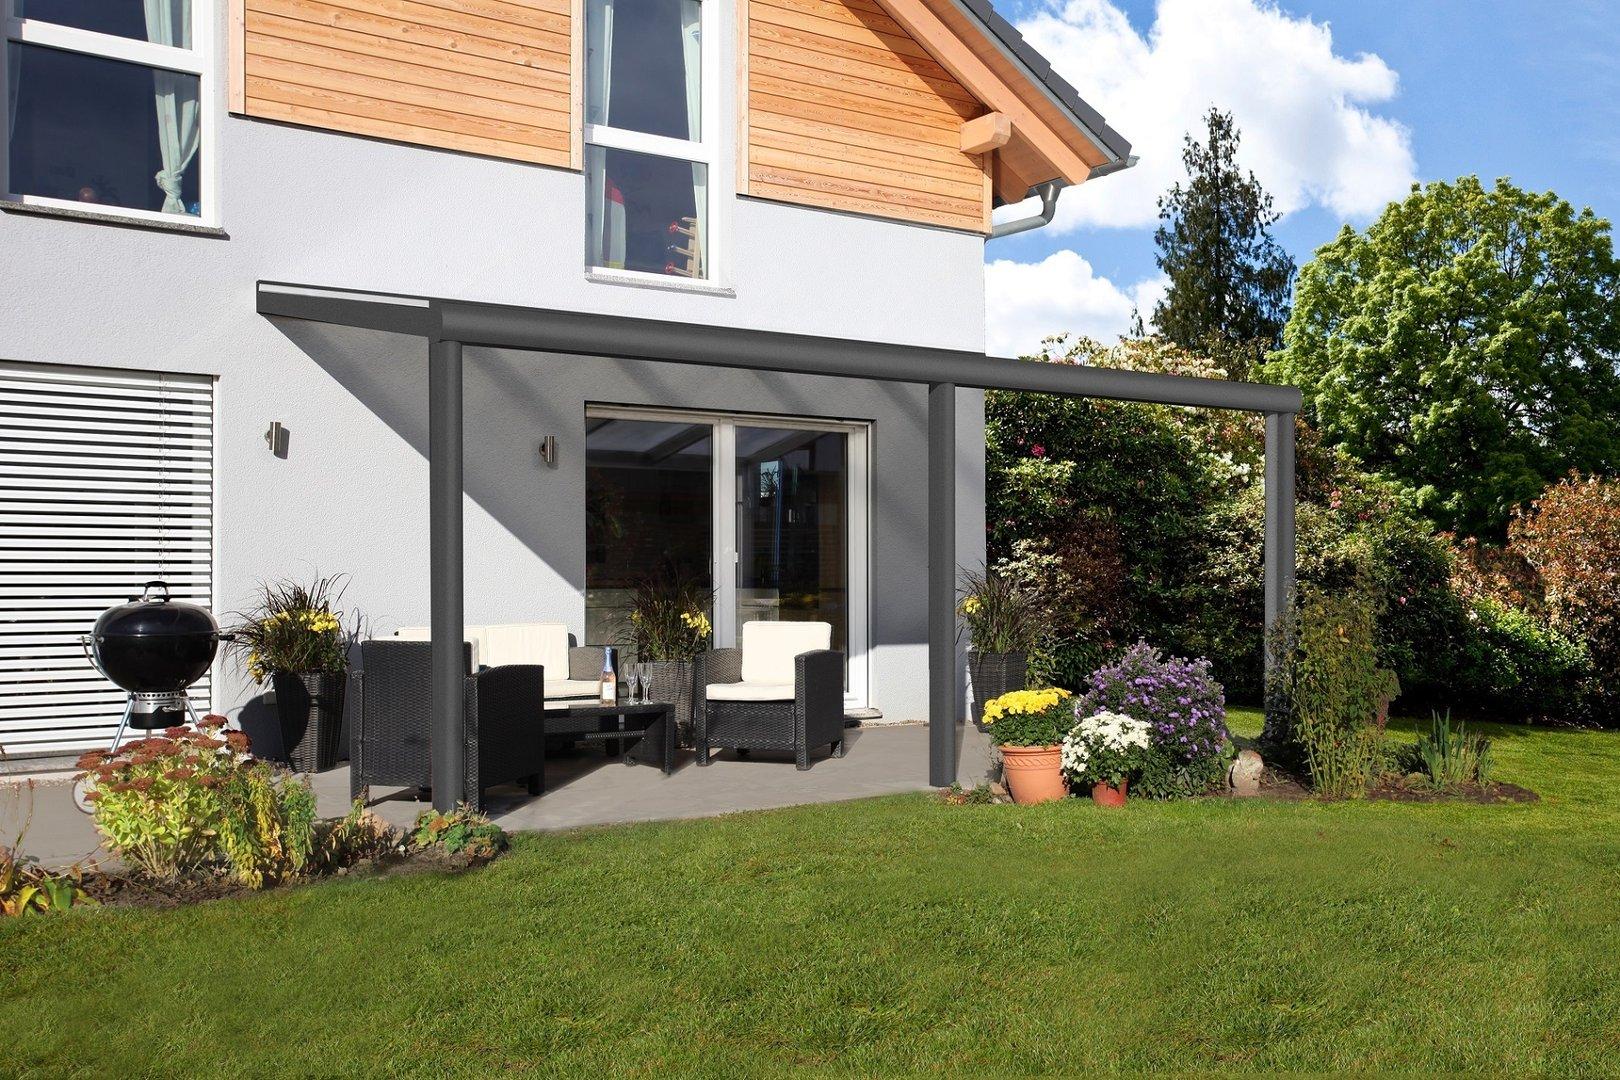 garda 4 terrassen berdachung alu sams gartenhaus shop. Black Bedroom Furniture Sets. Home Design Ideas